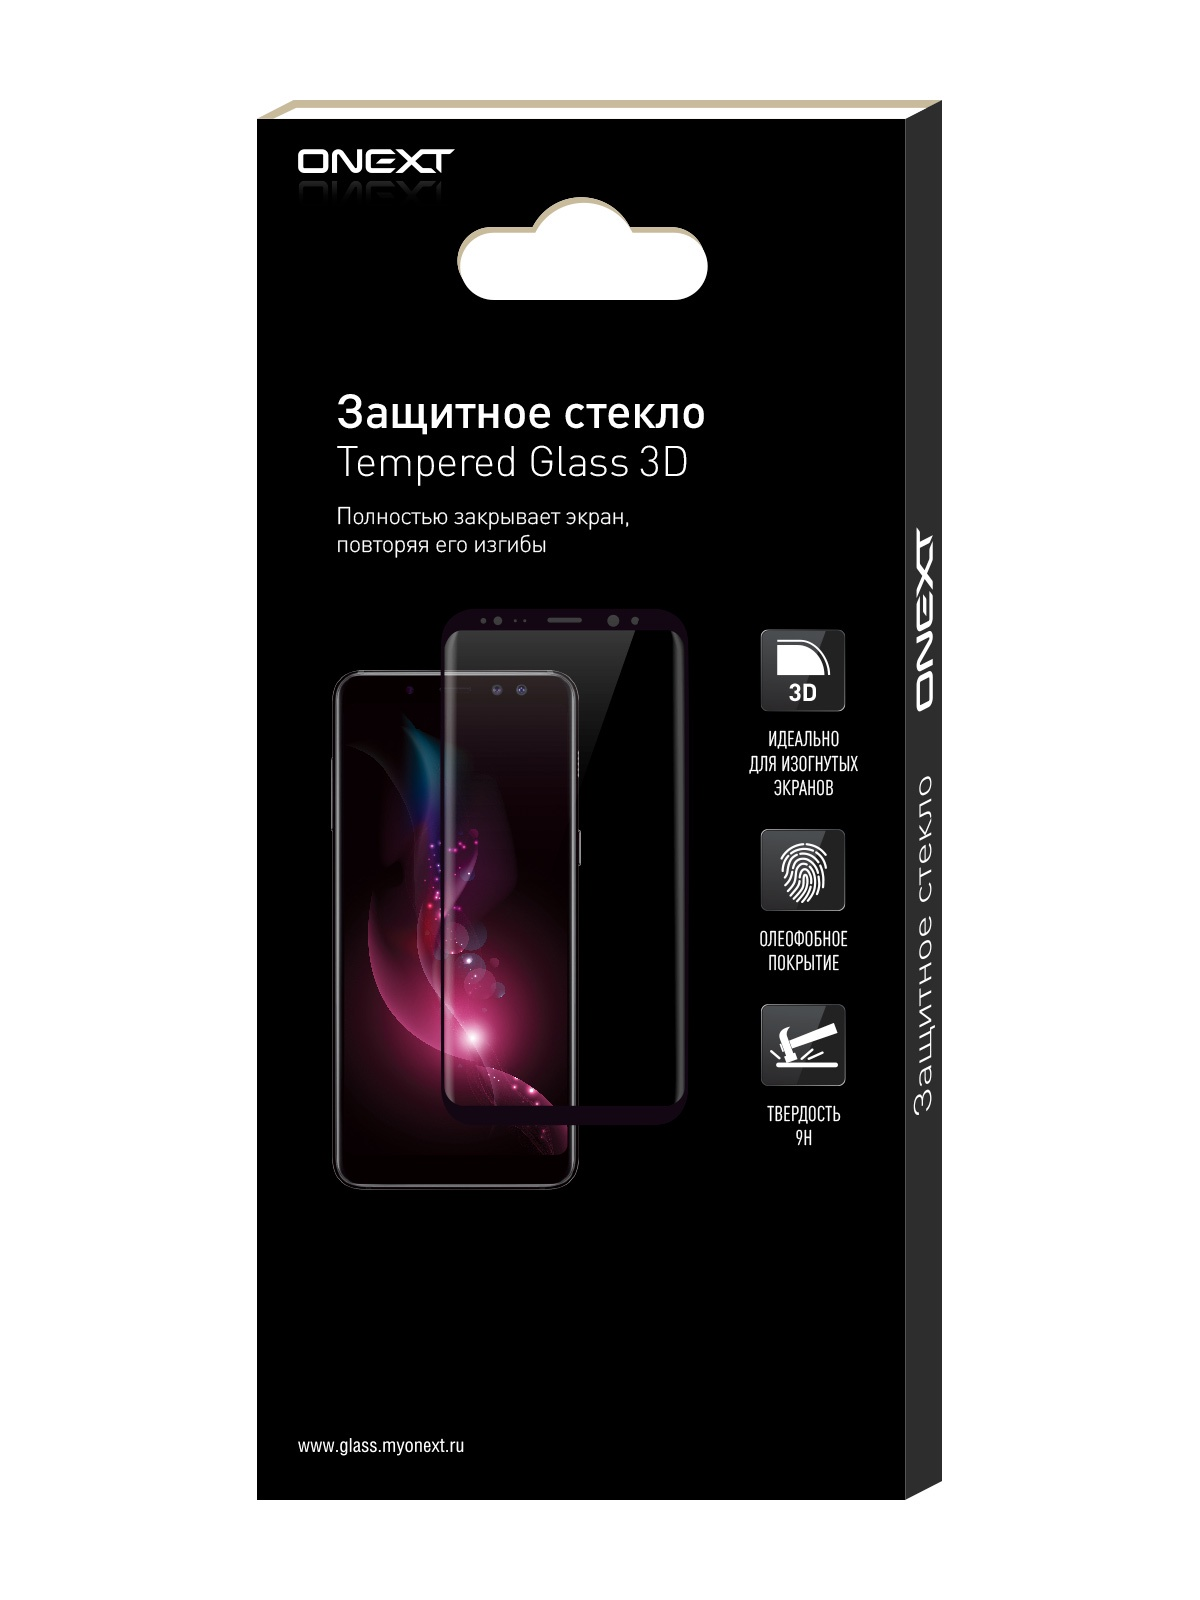 Защитное стекло ONEXT Huawei Mate 20 Lite, 3D стекло защитное стекло для huawei mate 20 lite onext